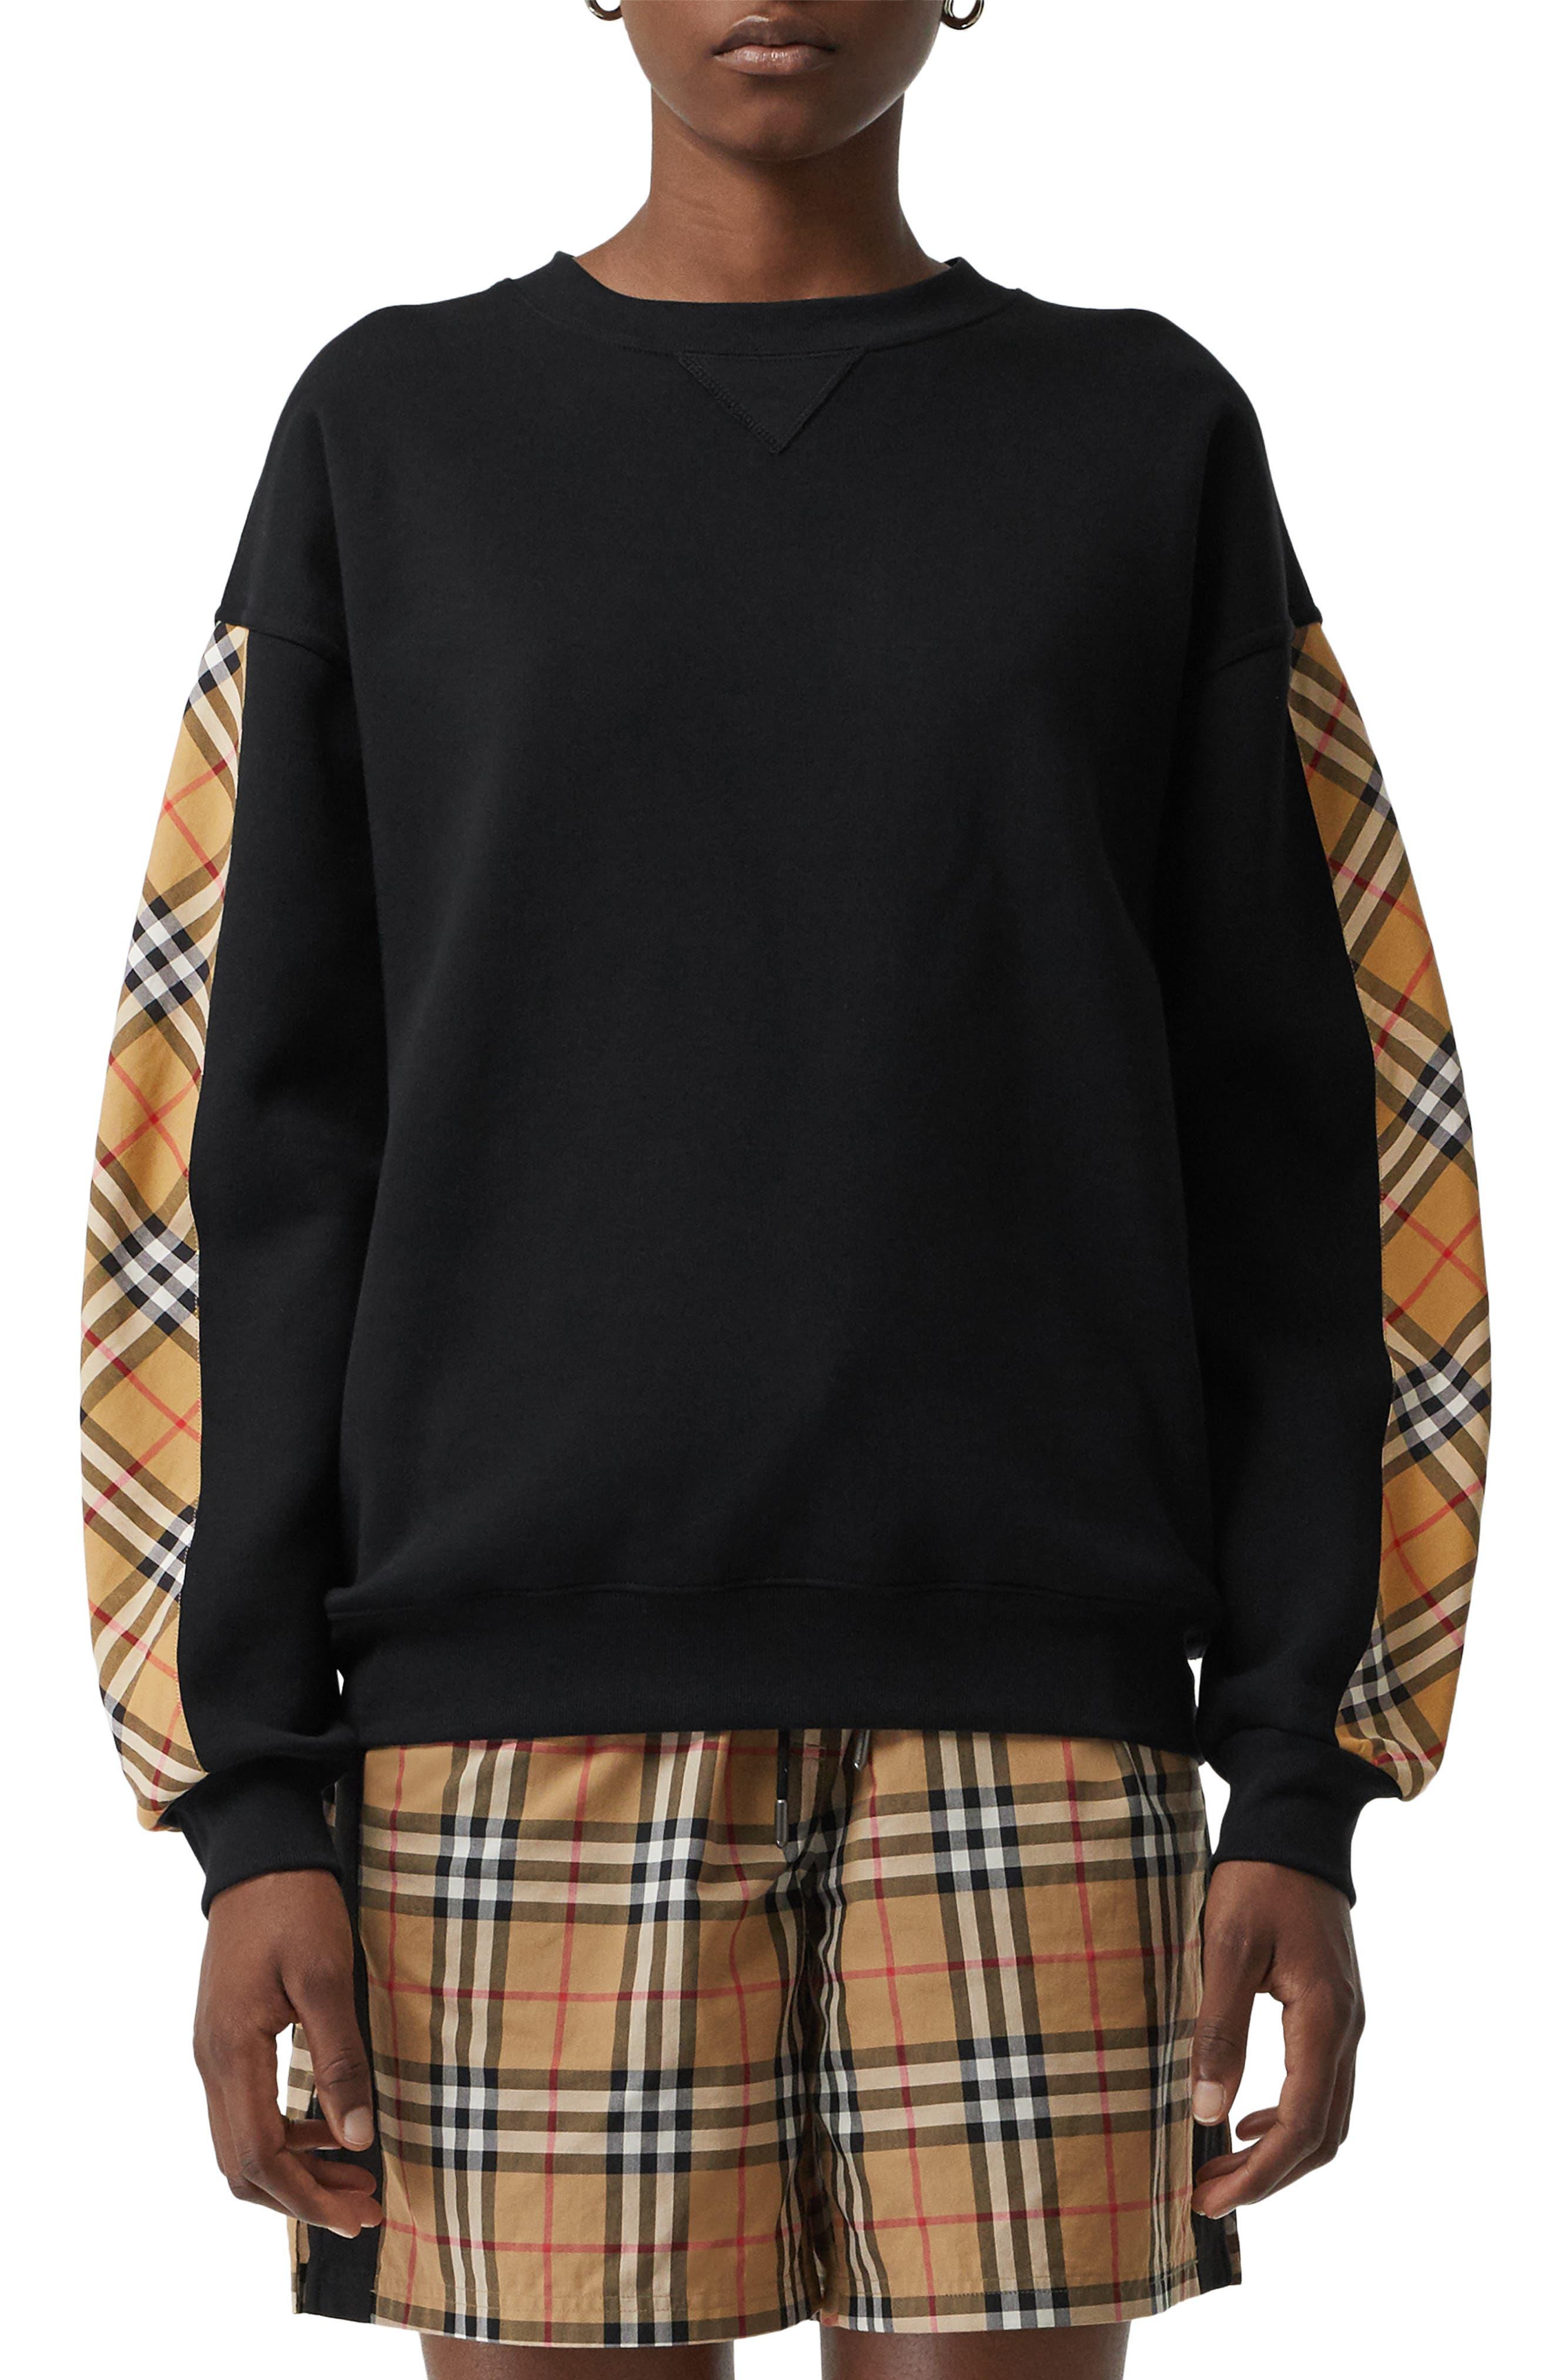 Bronx Check Sleeve Sweatshirt,                             Main thumbnail 1, color,                             BLACK